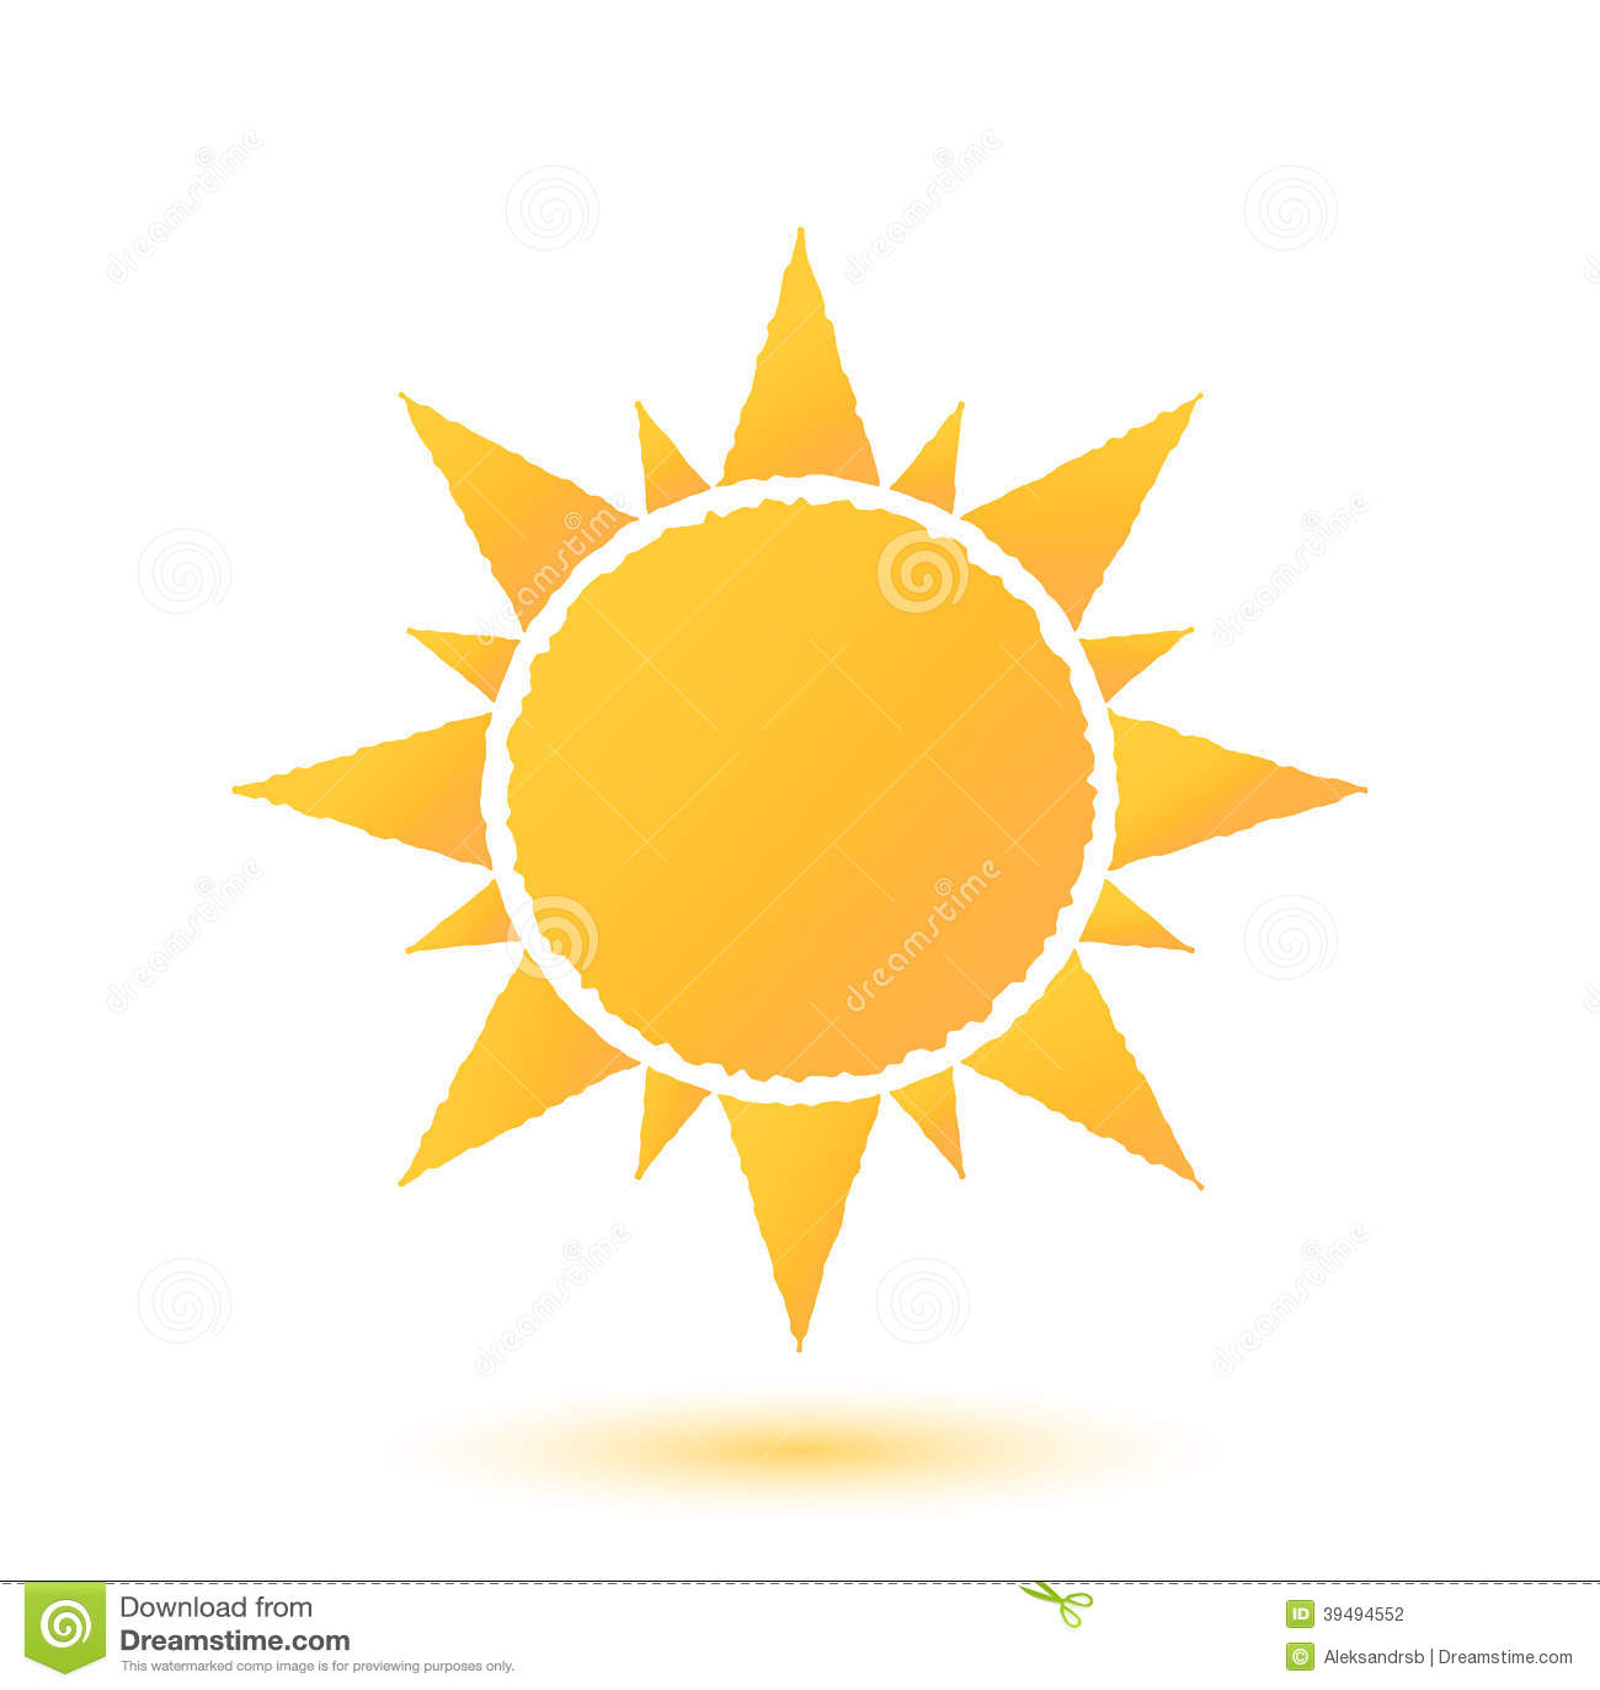 Simple illustration of abstract sun stock vector image for Illustration minimaliste